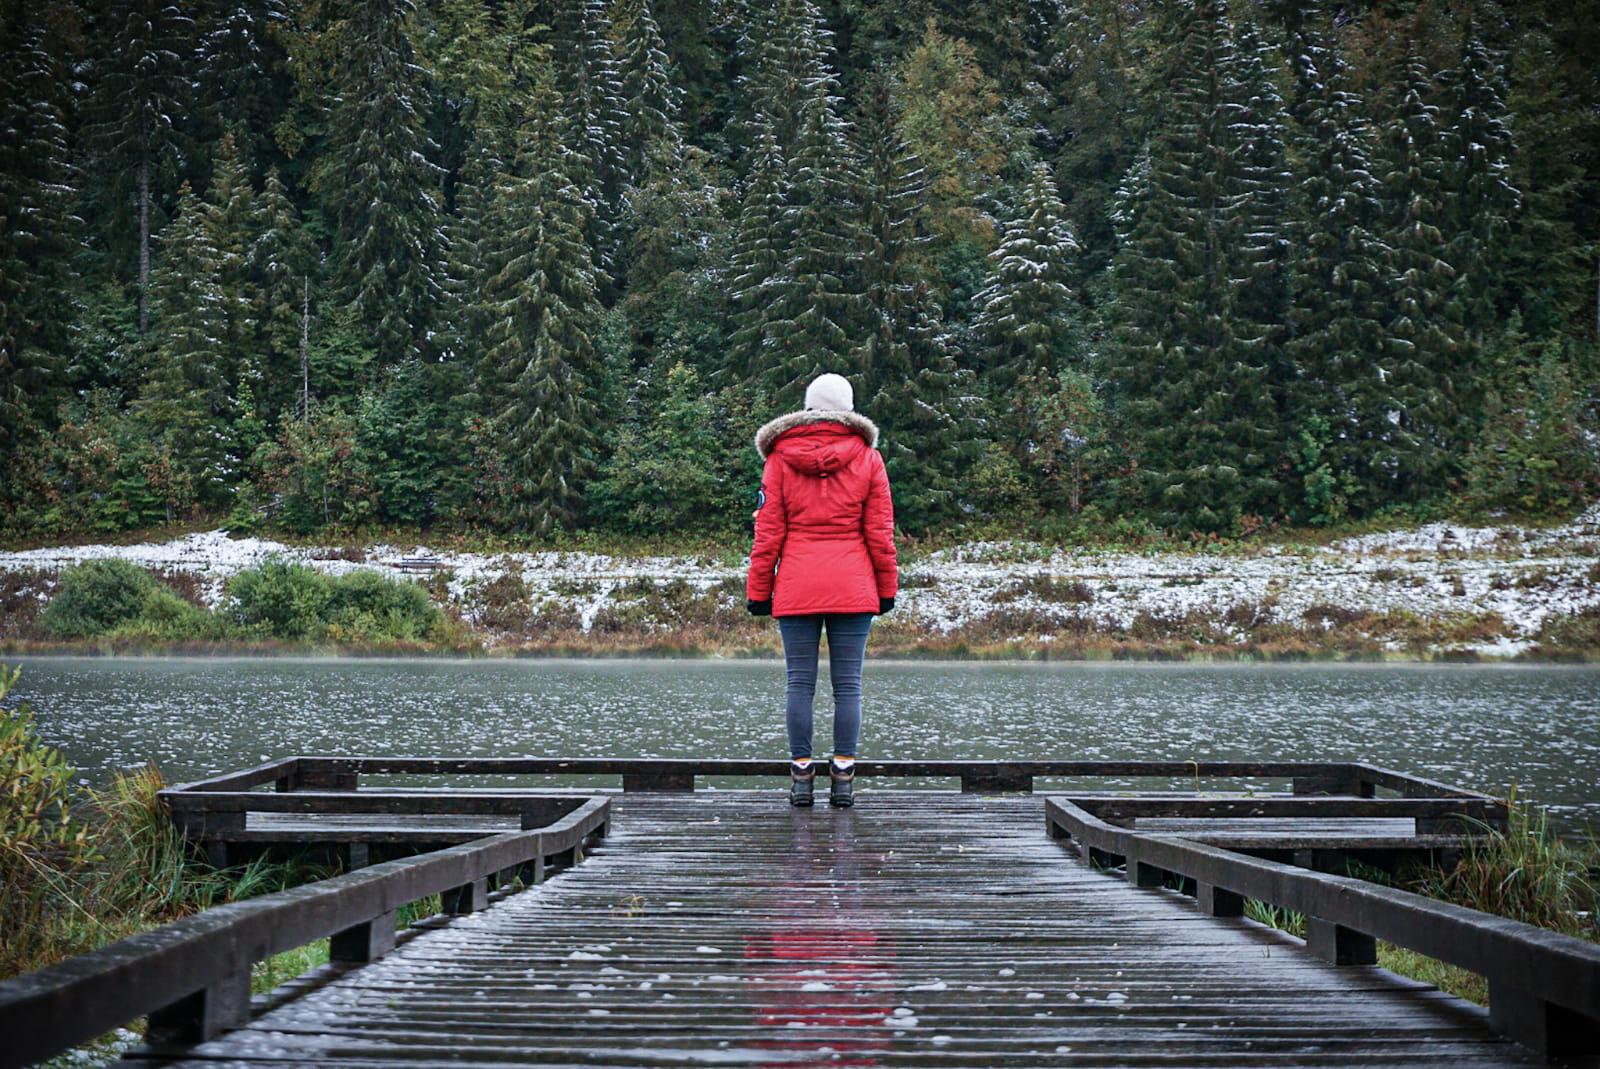 Jura lac Lamoura ponton bois sapins neige personne manteau rouge